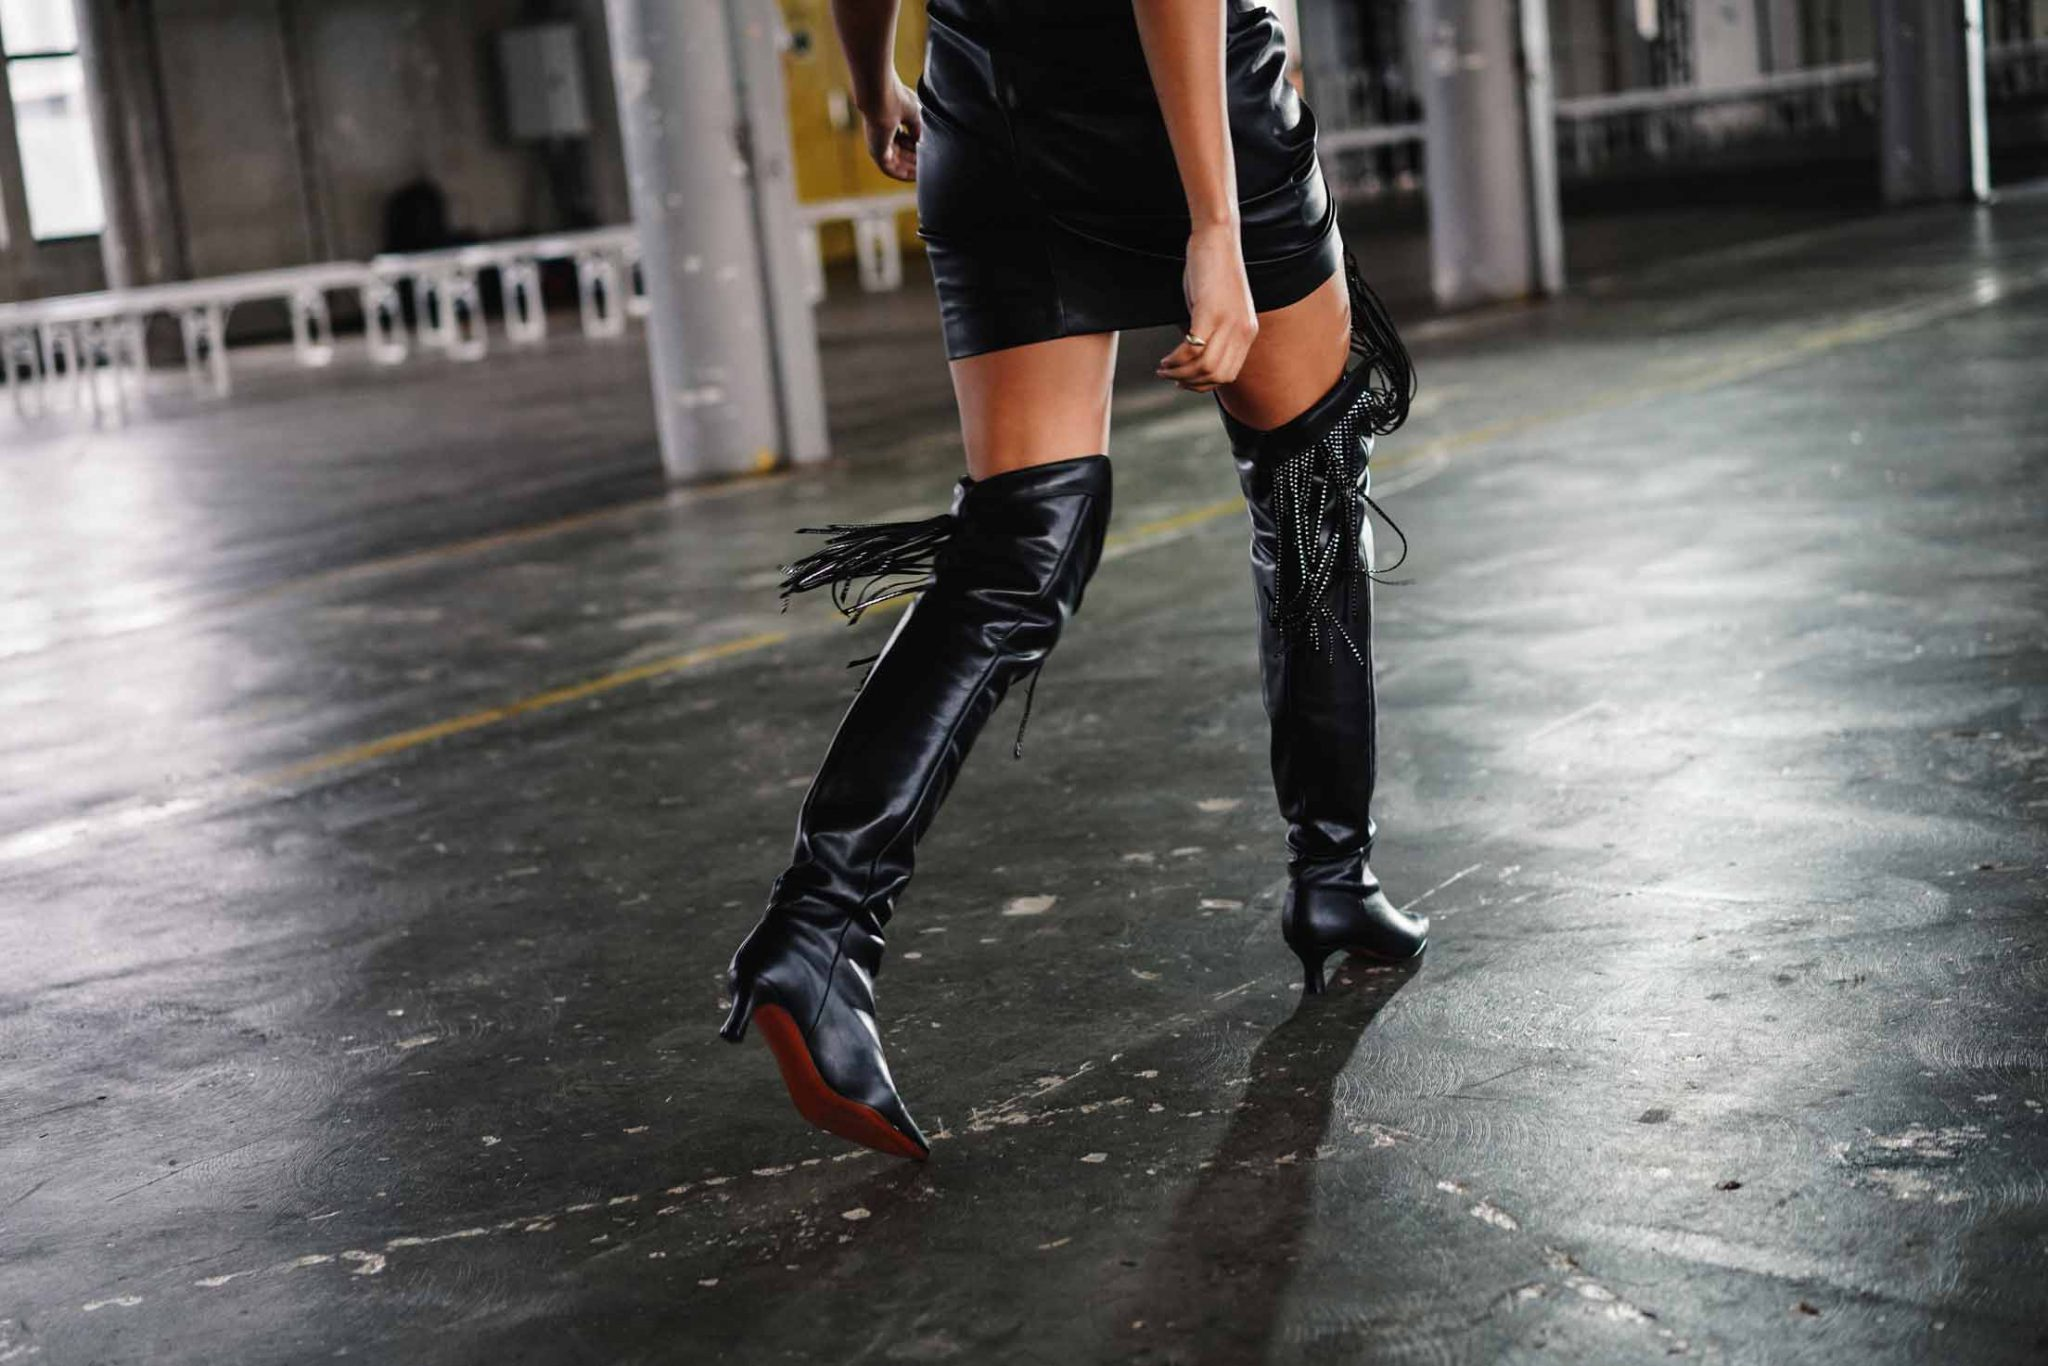 Ilsoo_van_Dijk_Ilsoovandijk_AFW_Toral_Backstage_Amsterdam_Fashion_week_2020_-scaled_6